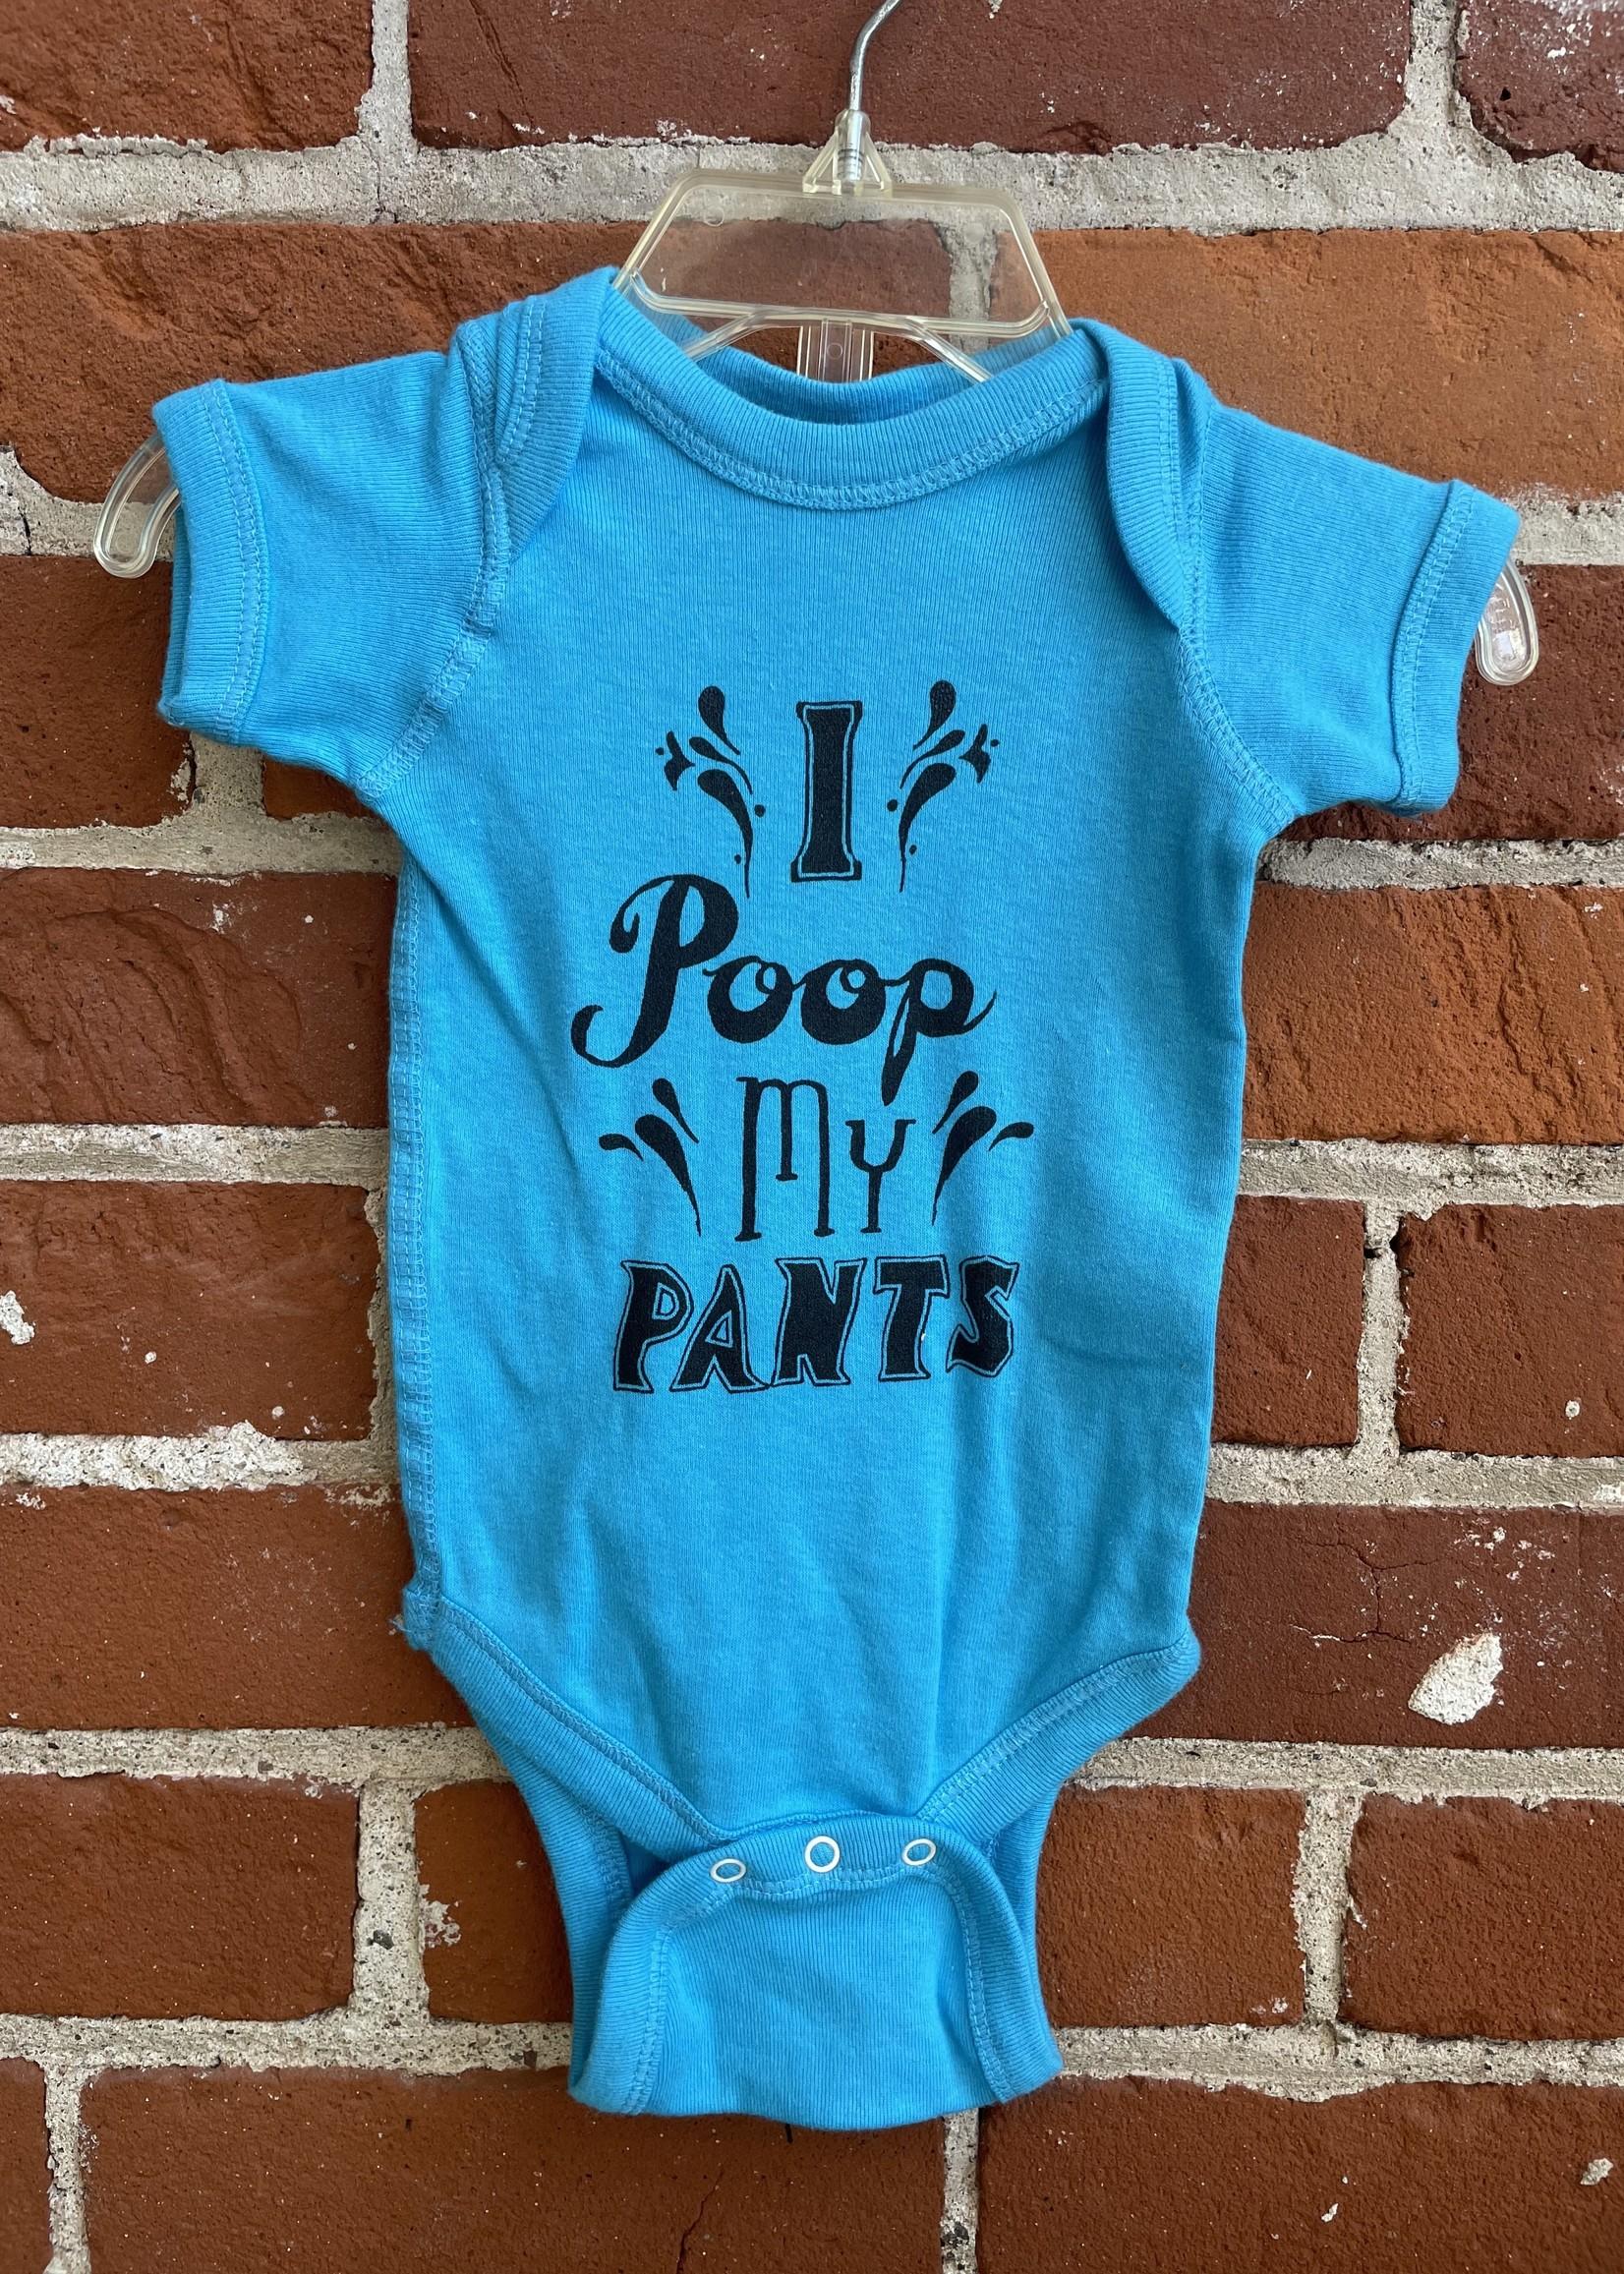 I Poop My Pants Baby Body Suit